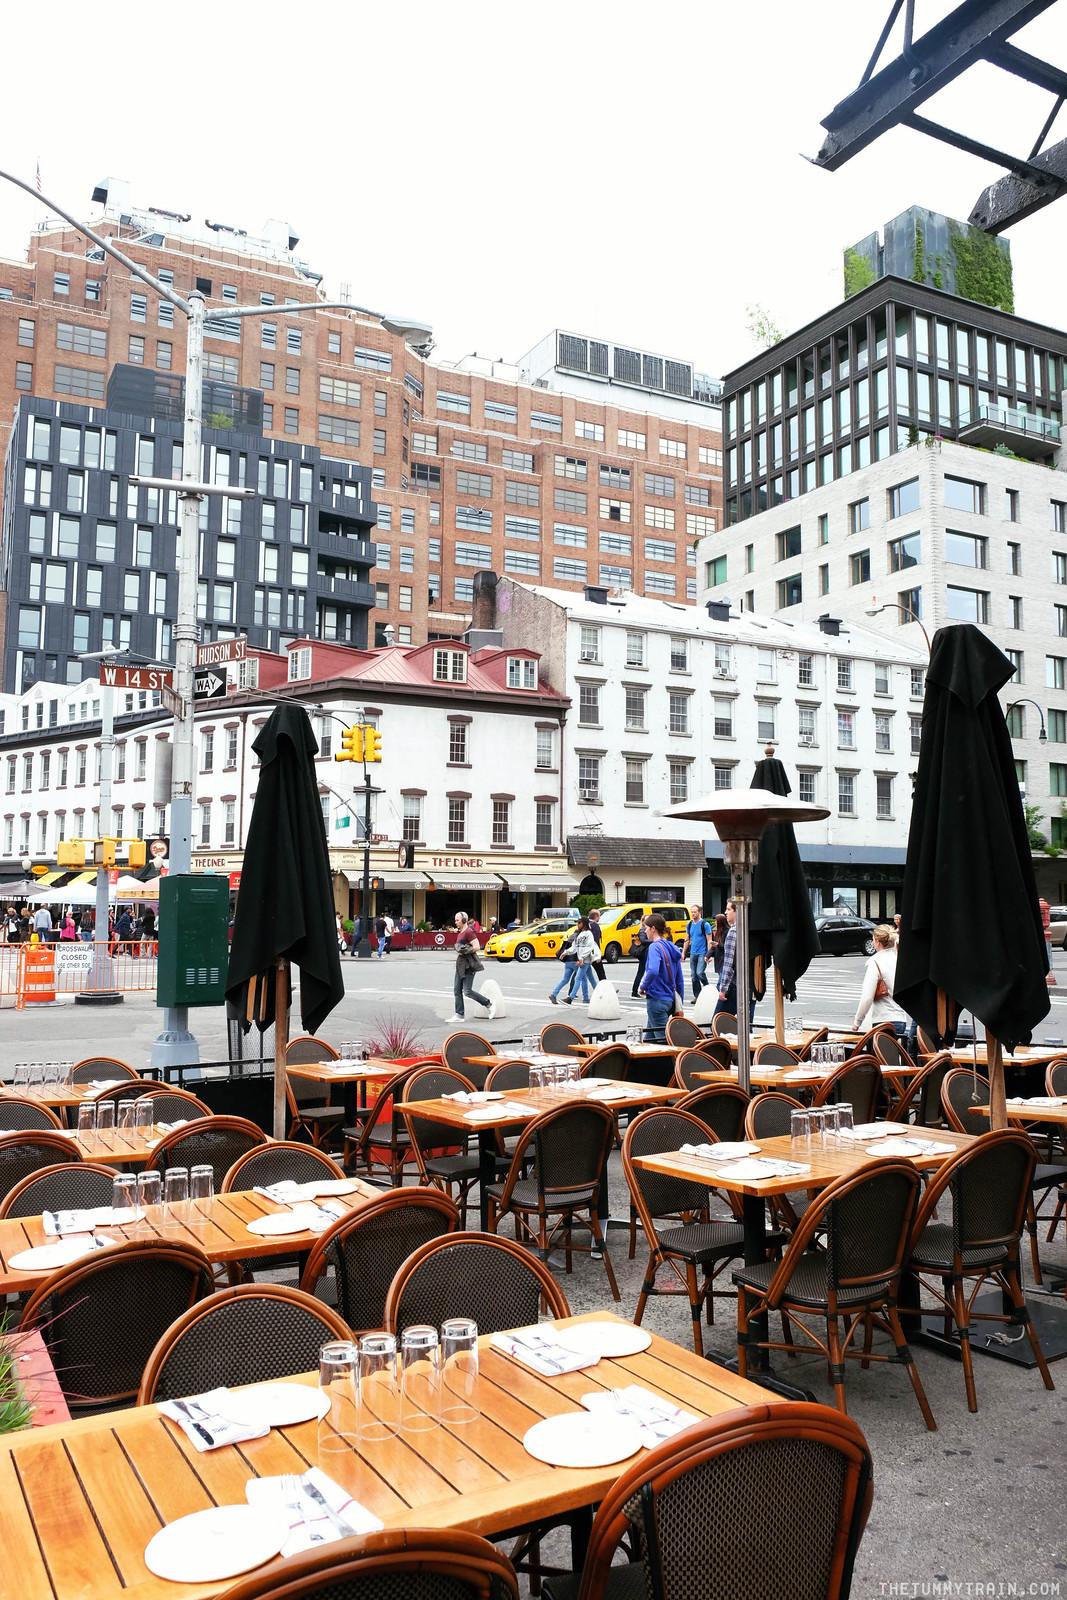 30393139246 d47daa1d2d h - USA 2016 Travel Diary: Walking on The High Line